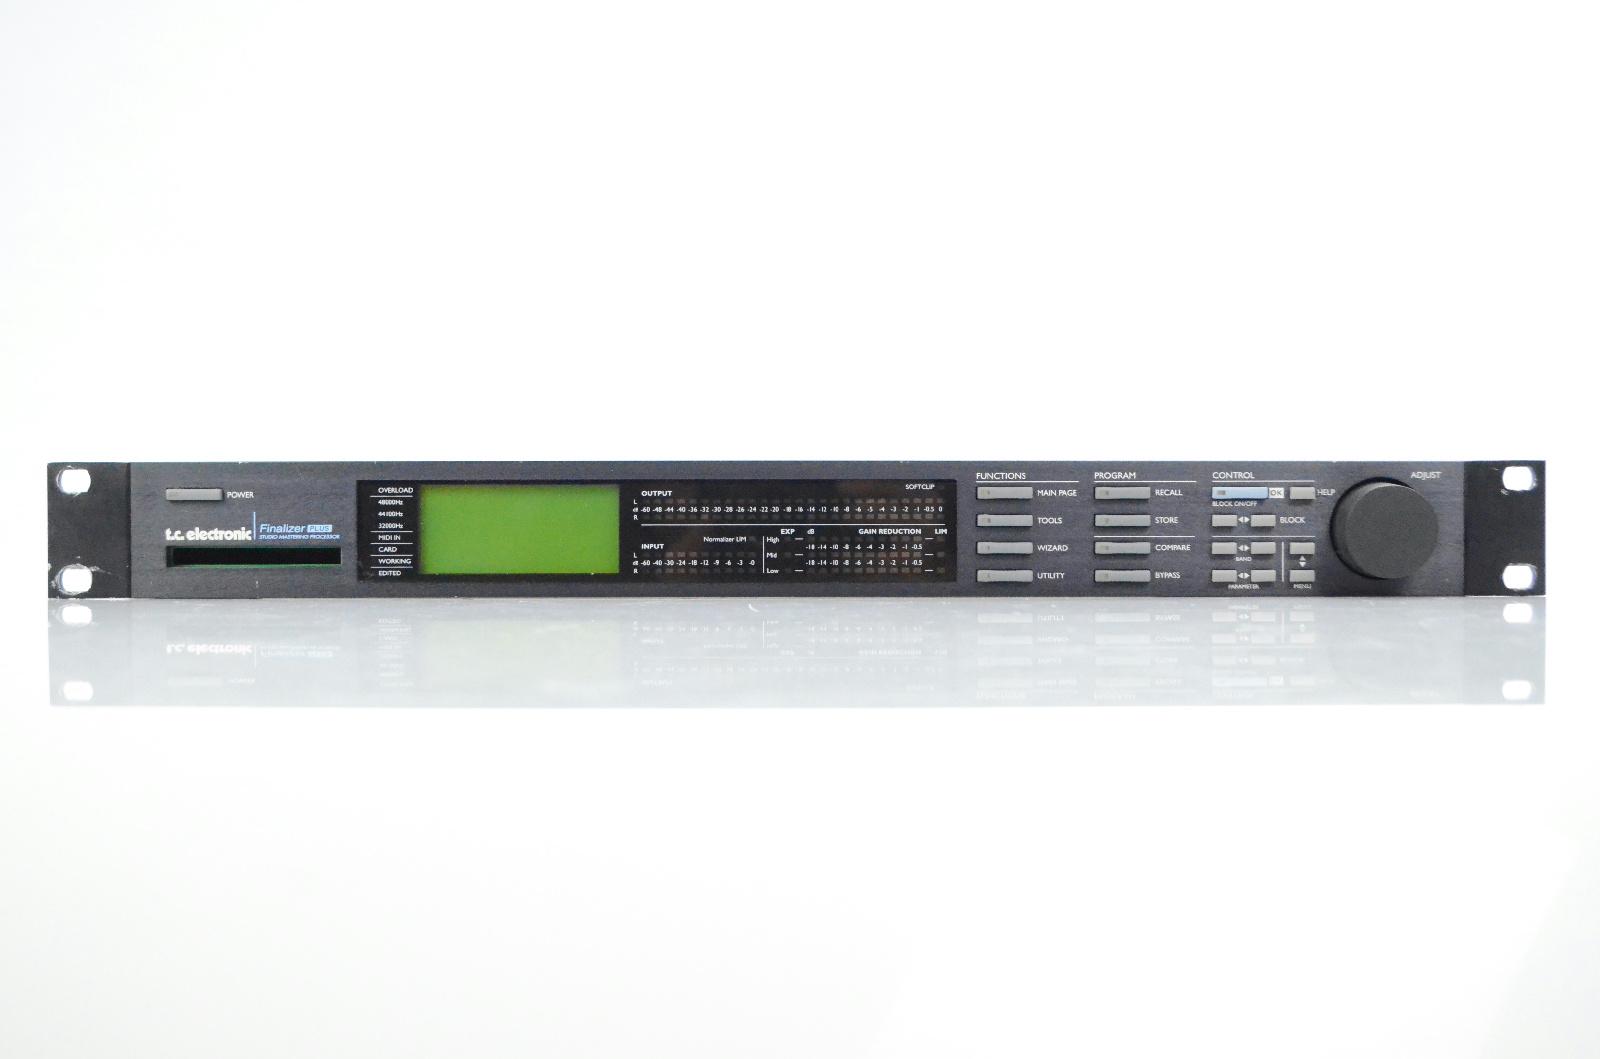 TC Electronic Finalizer Plus Mastering Processor Owned by Kato Khandwala #33632